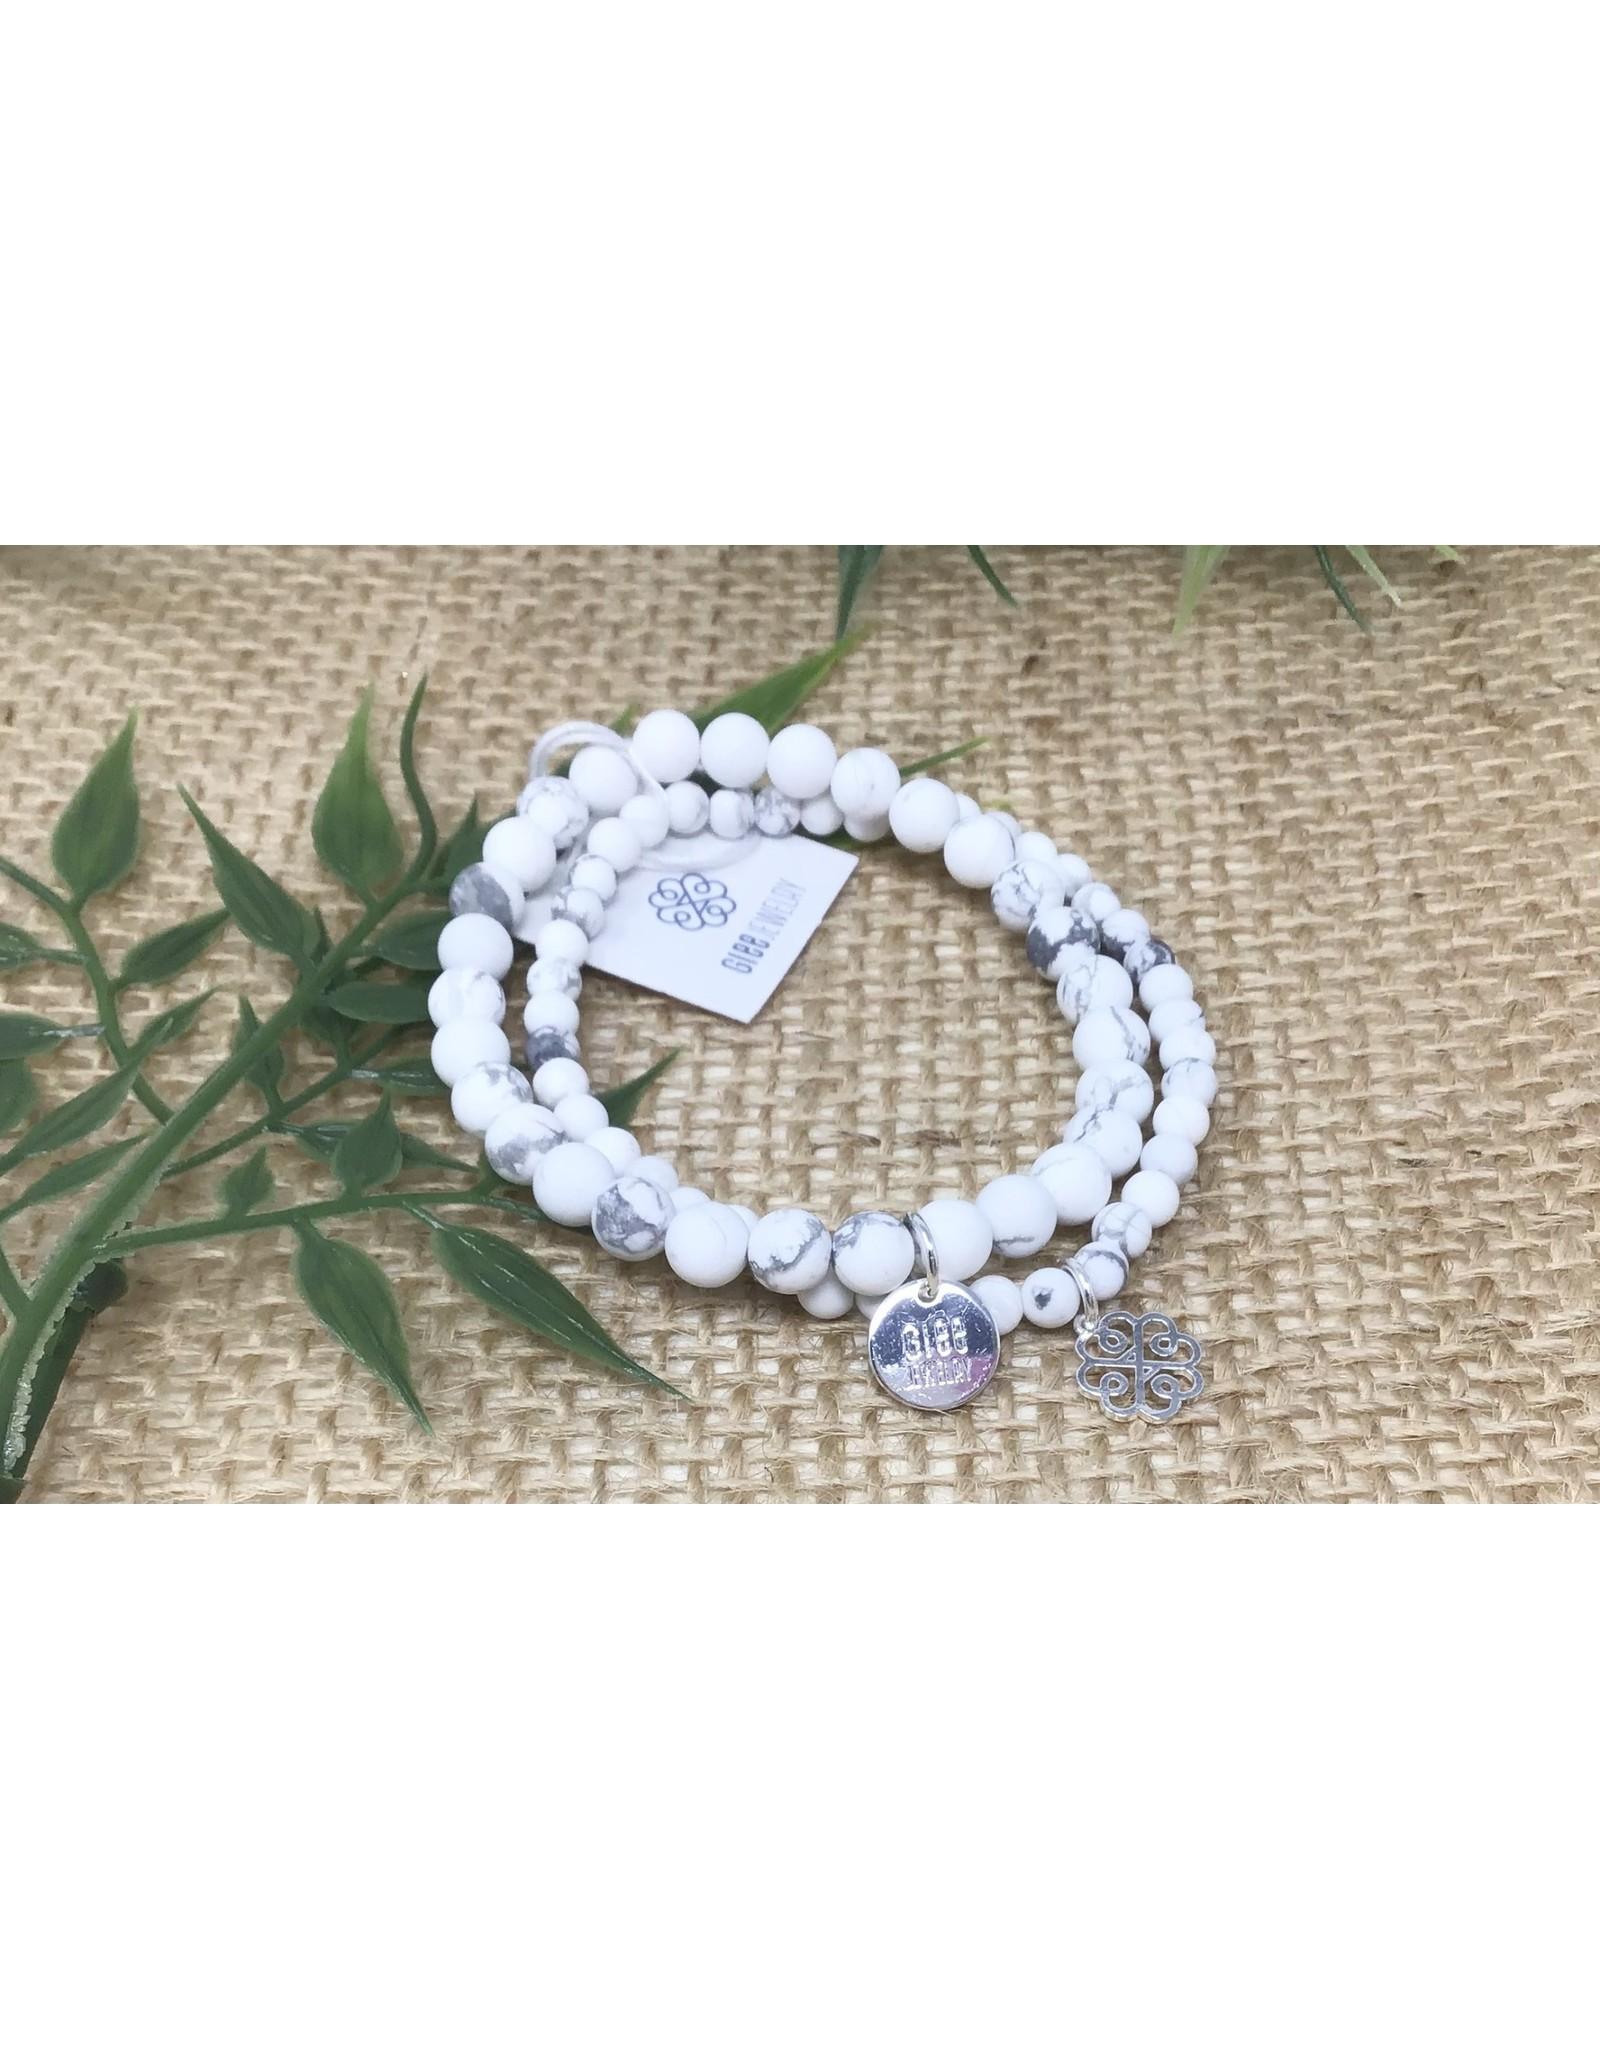 Glee jewelry Stackem Up Bracelets, Silver/Howlite